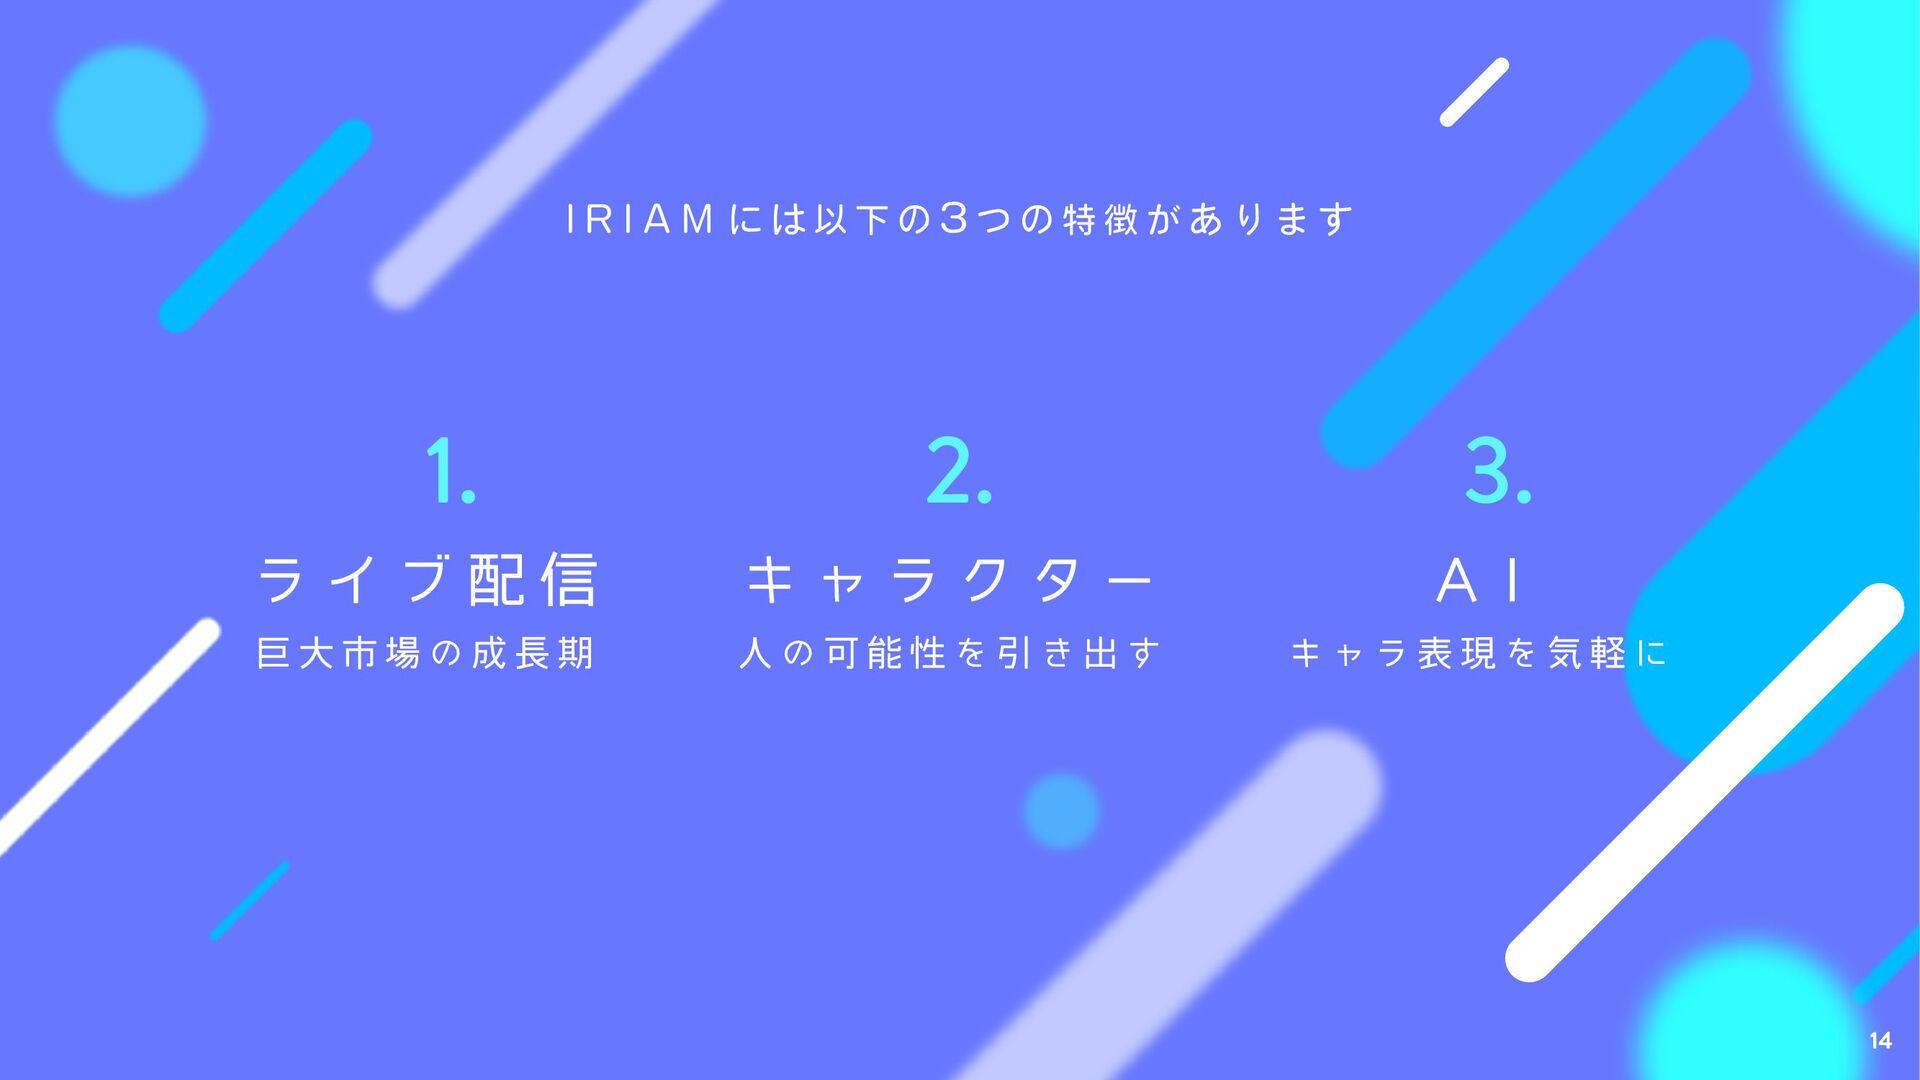 I R I A M の特徴 14 I R I A M ライブ配信  巨大市場の成長期 1. キ...